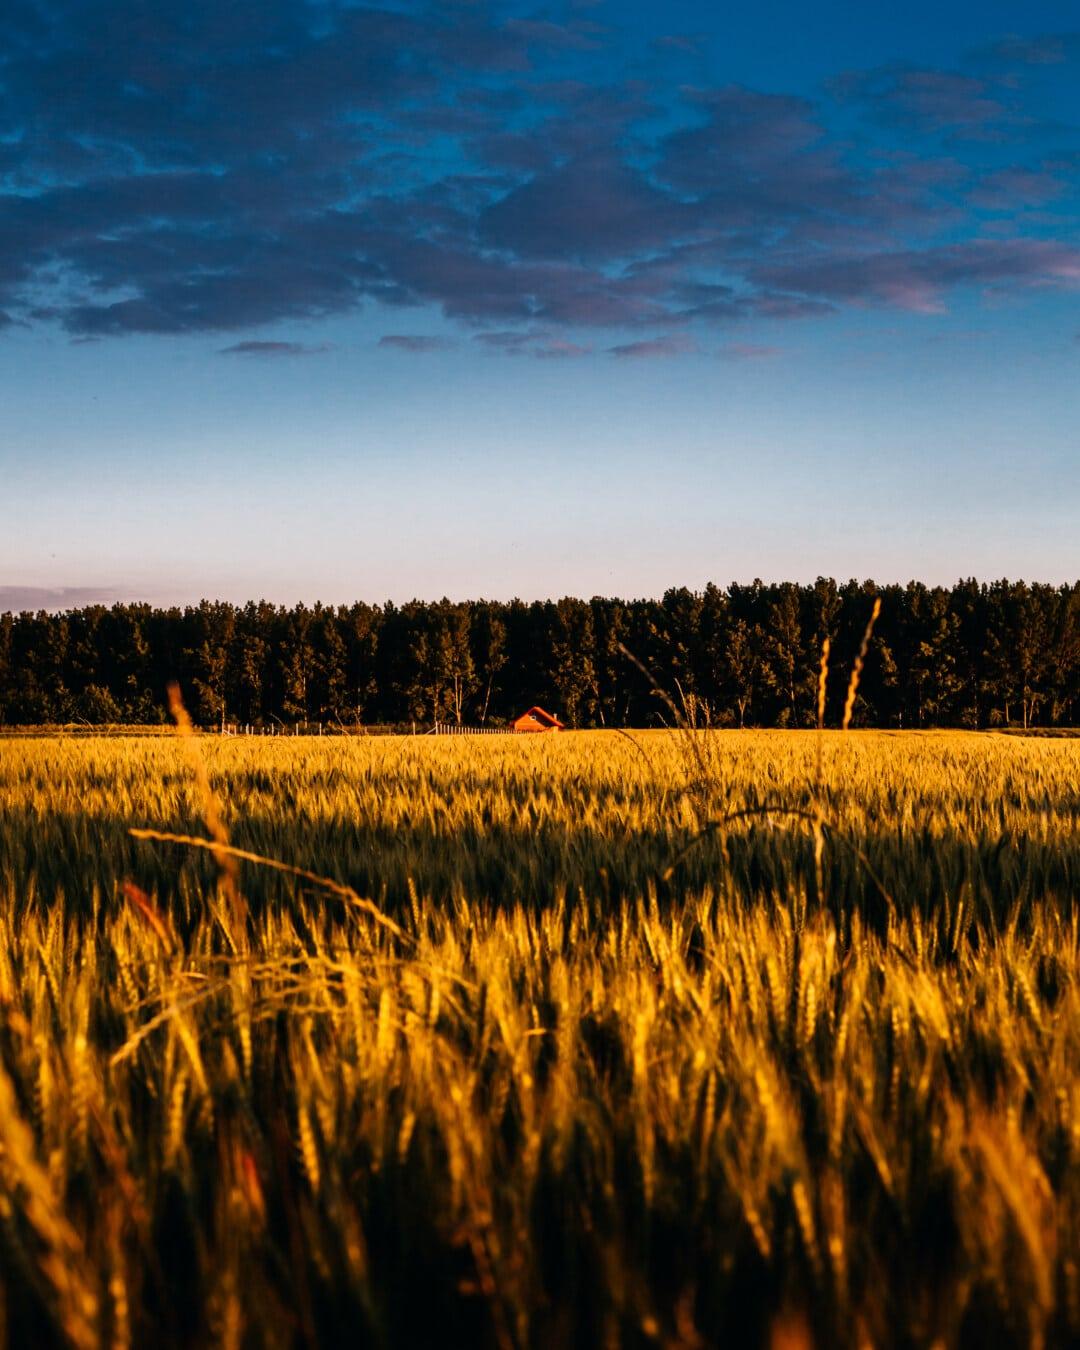 sunset, wheatfield, clouds, dramatic, wheat, rural, grass, cereal, summer, dawn